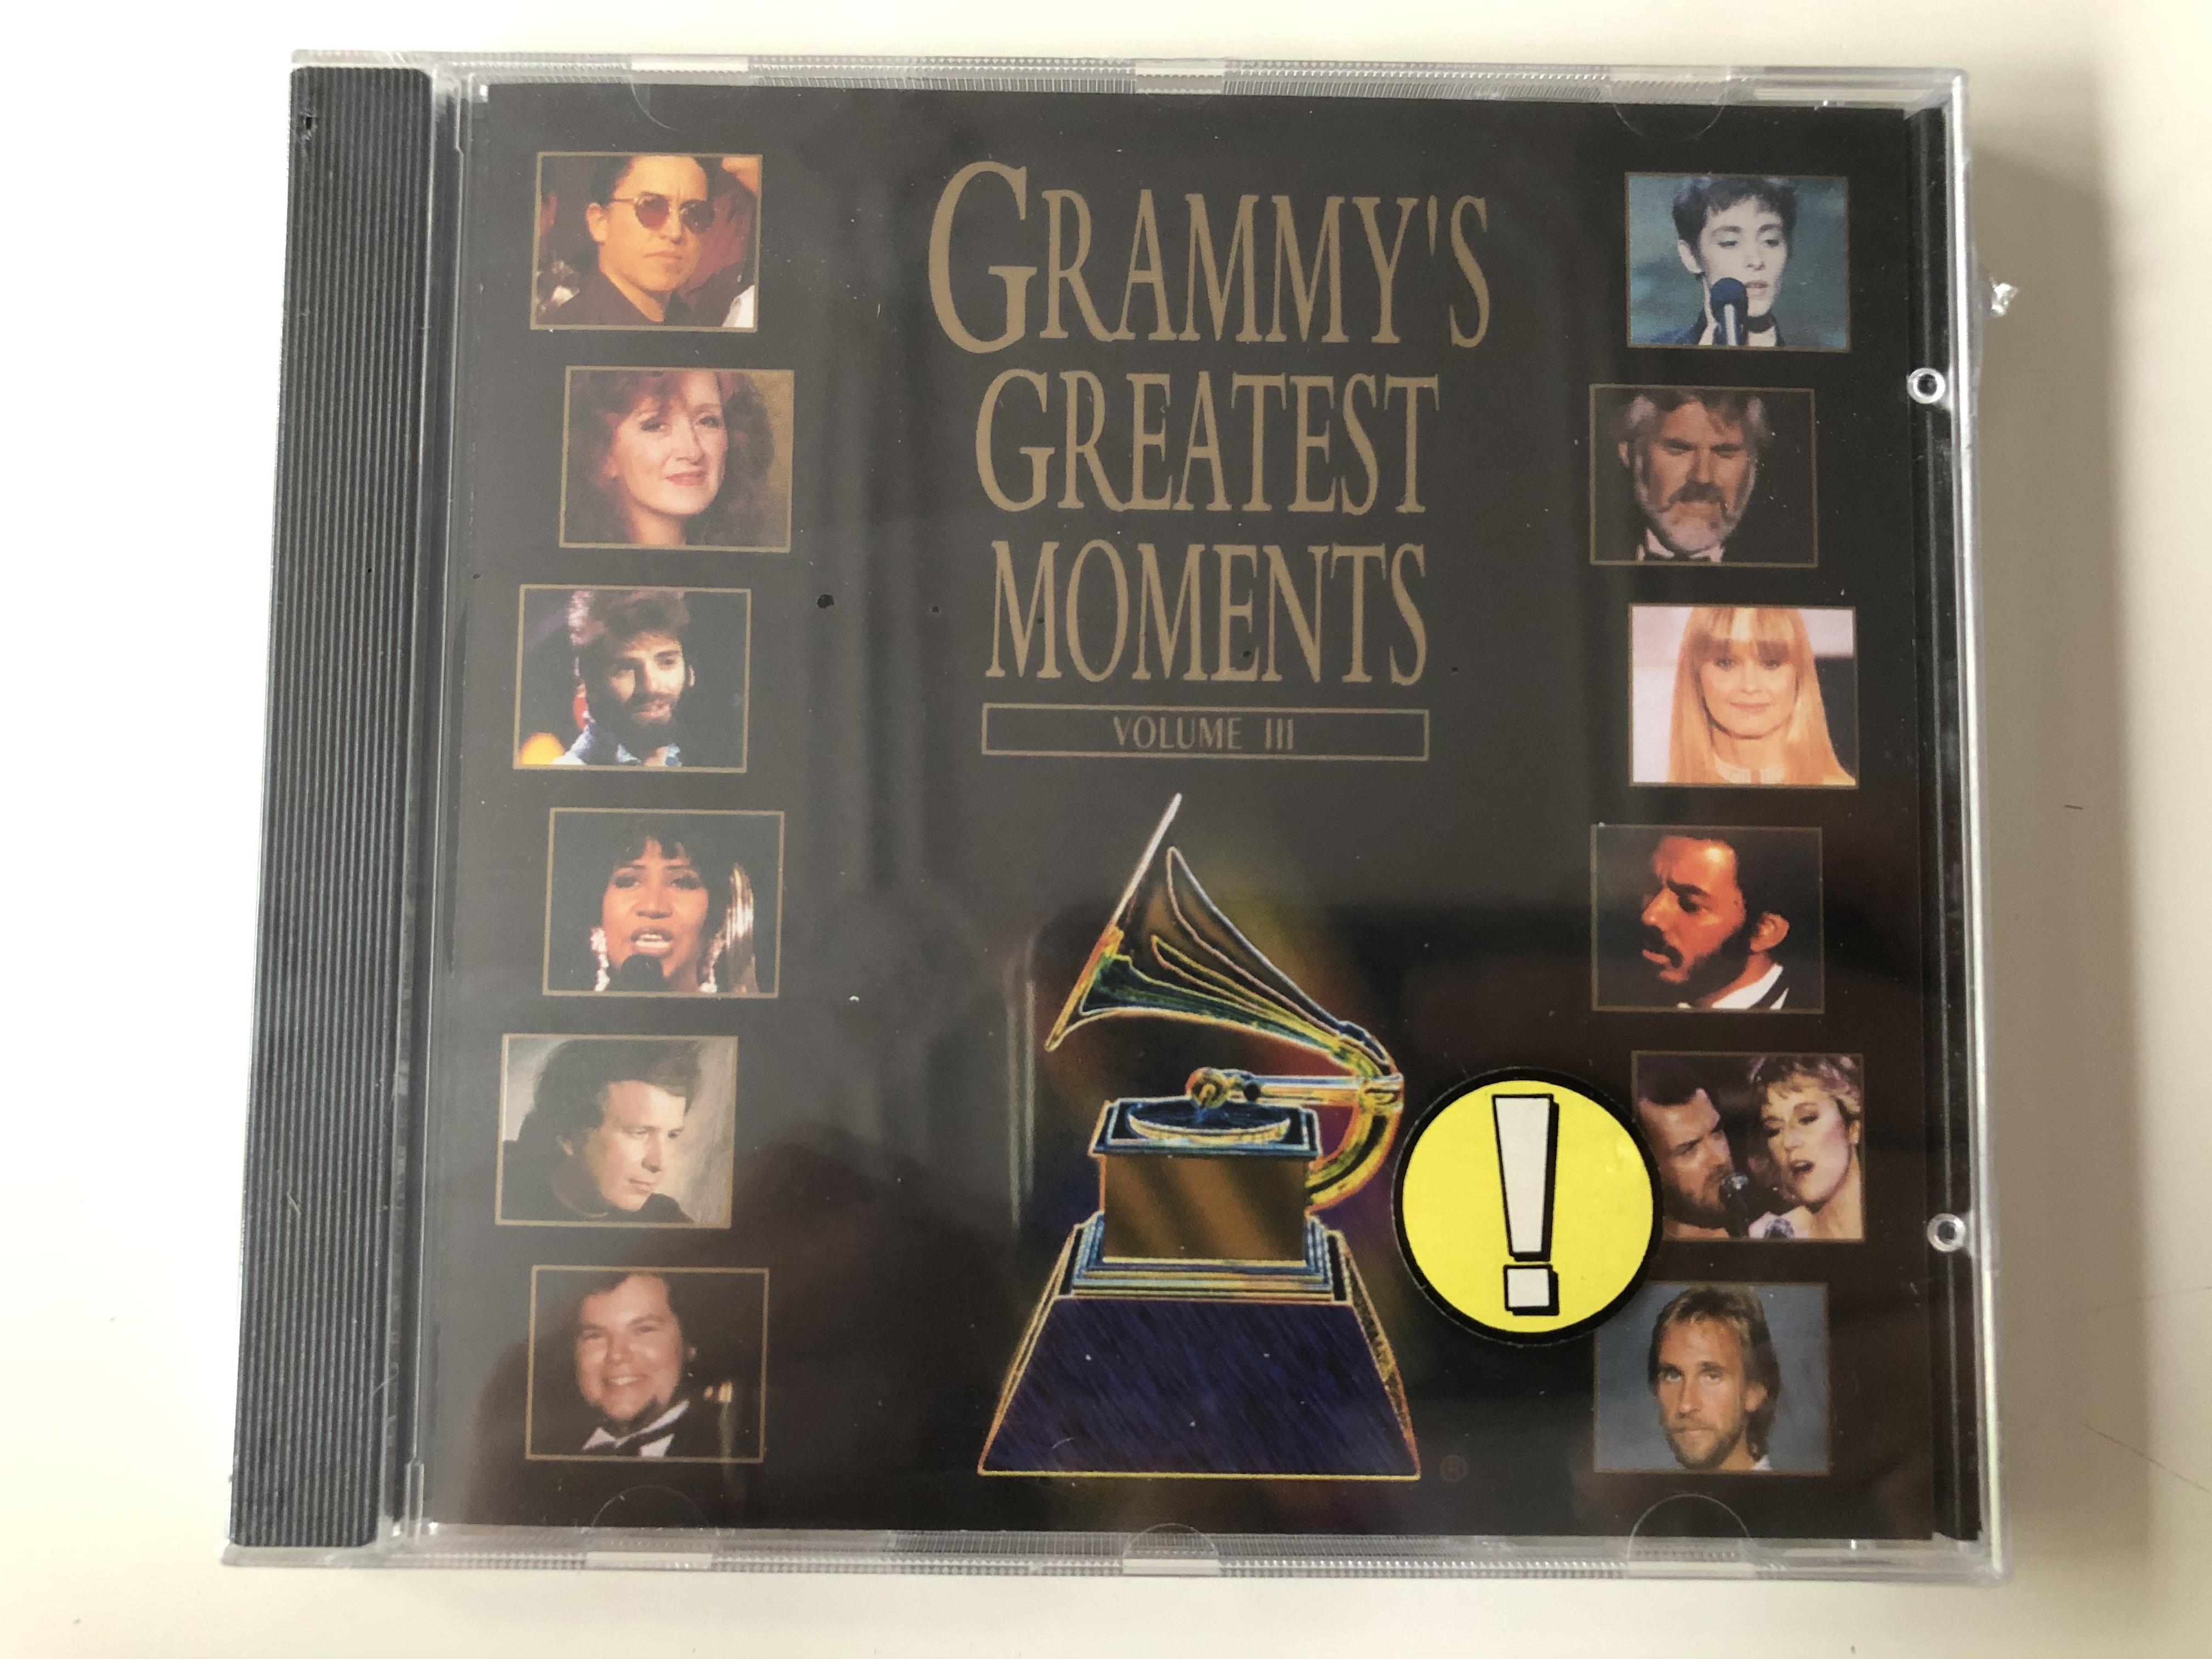 grammy-s-greatest-moments-volume-iii-atlantic-audio-cd-1994-7567-82576-2-1-.jpg